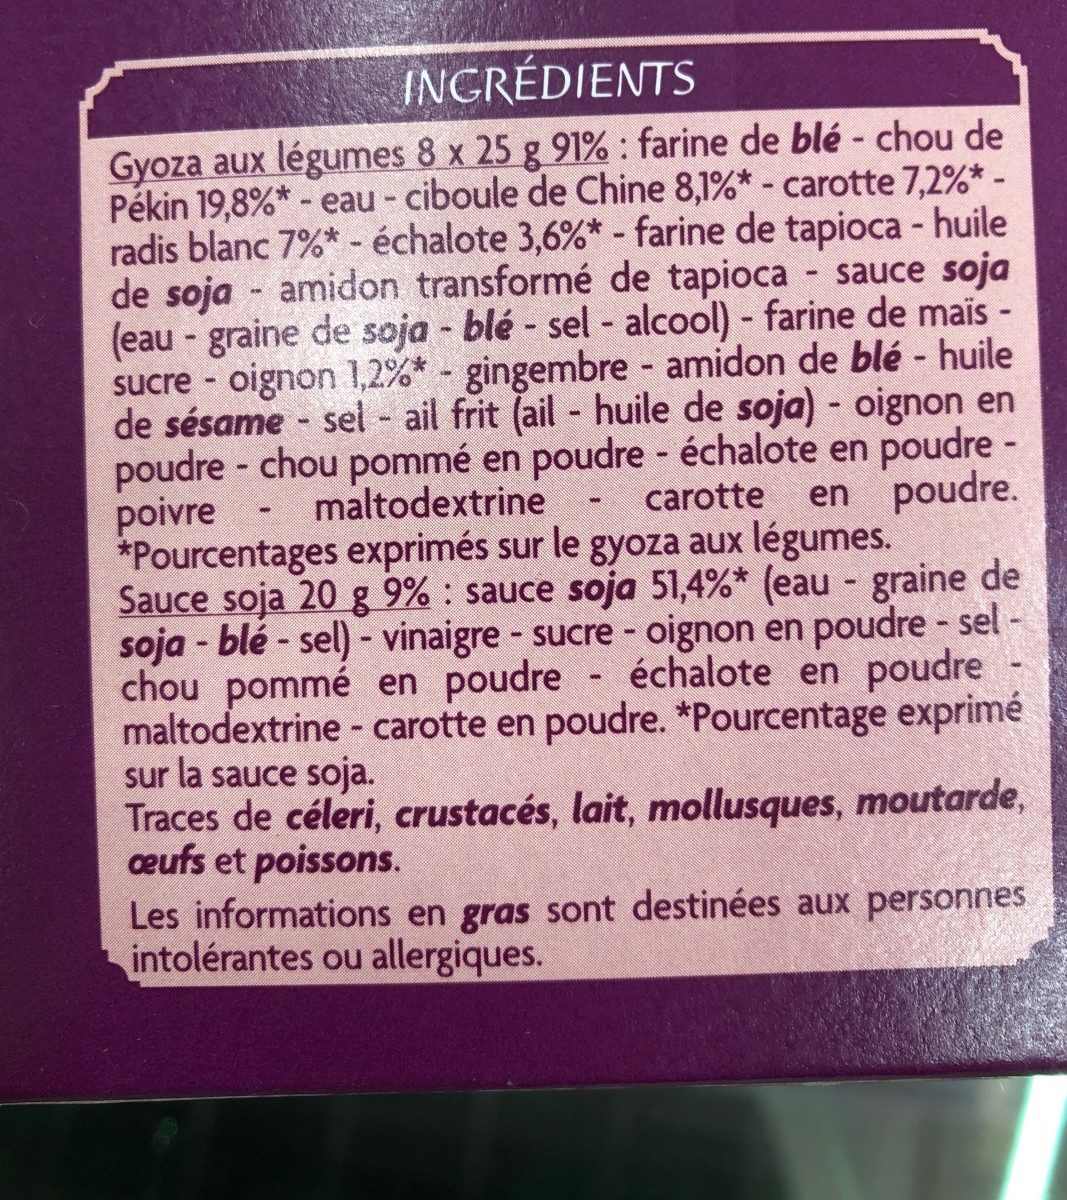 8 Gyoza aux légumes sauce soja - Ingredients